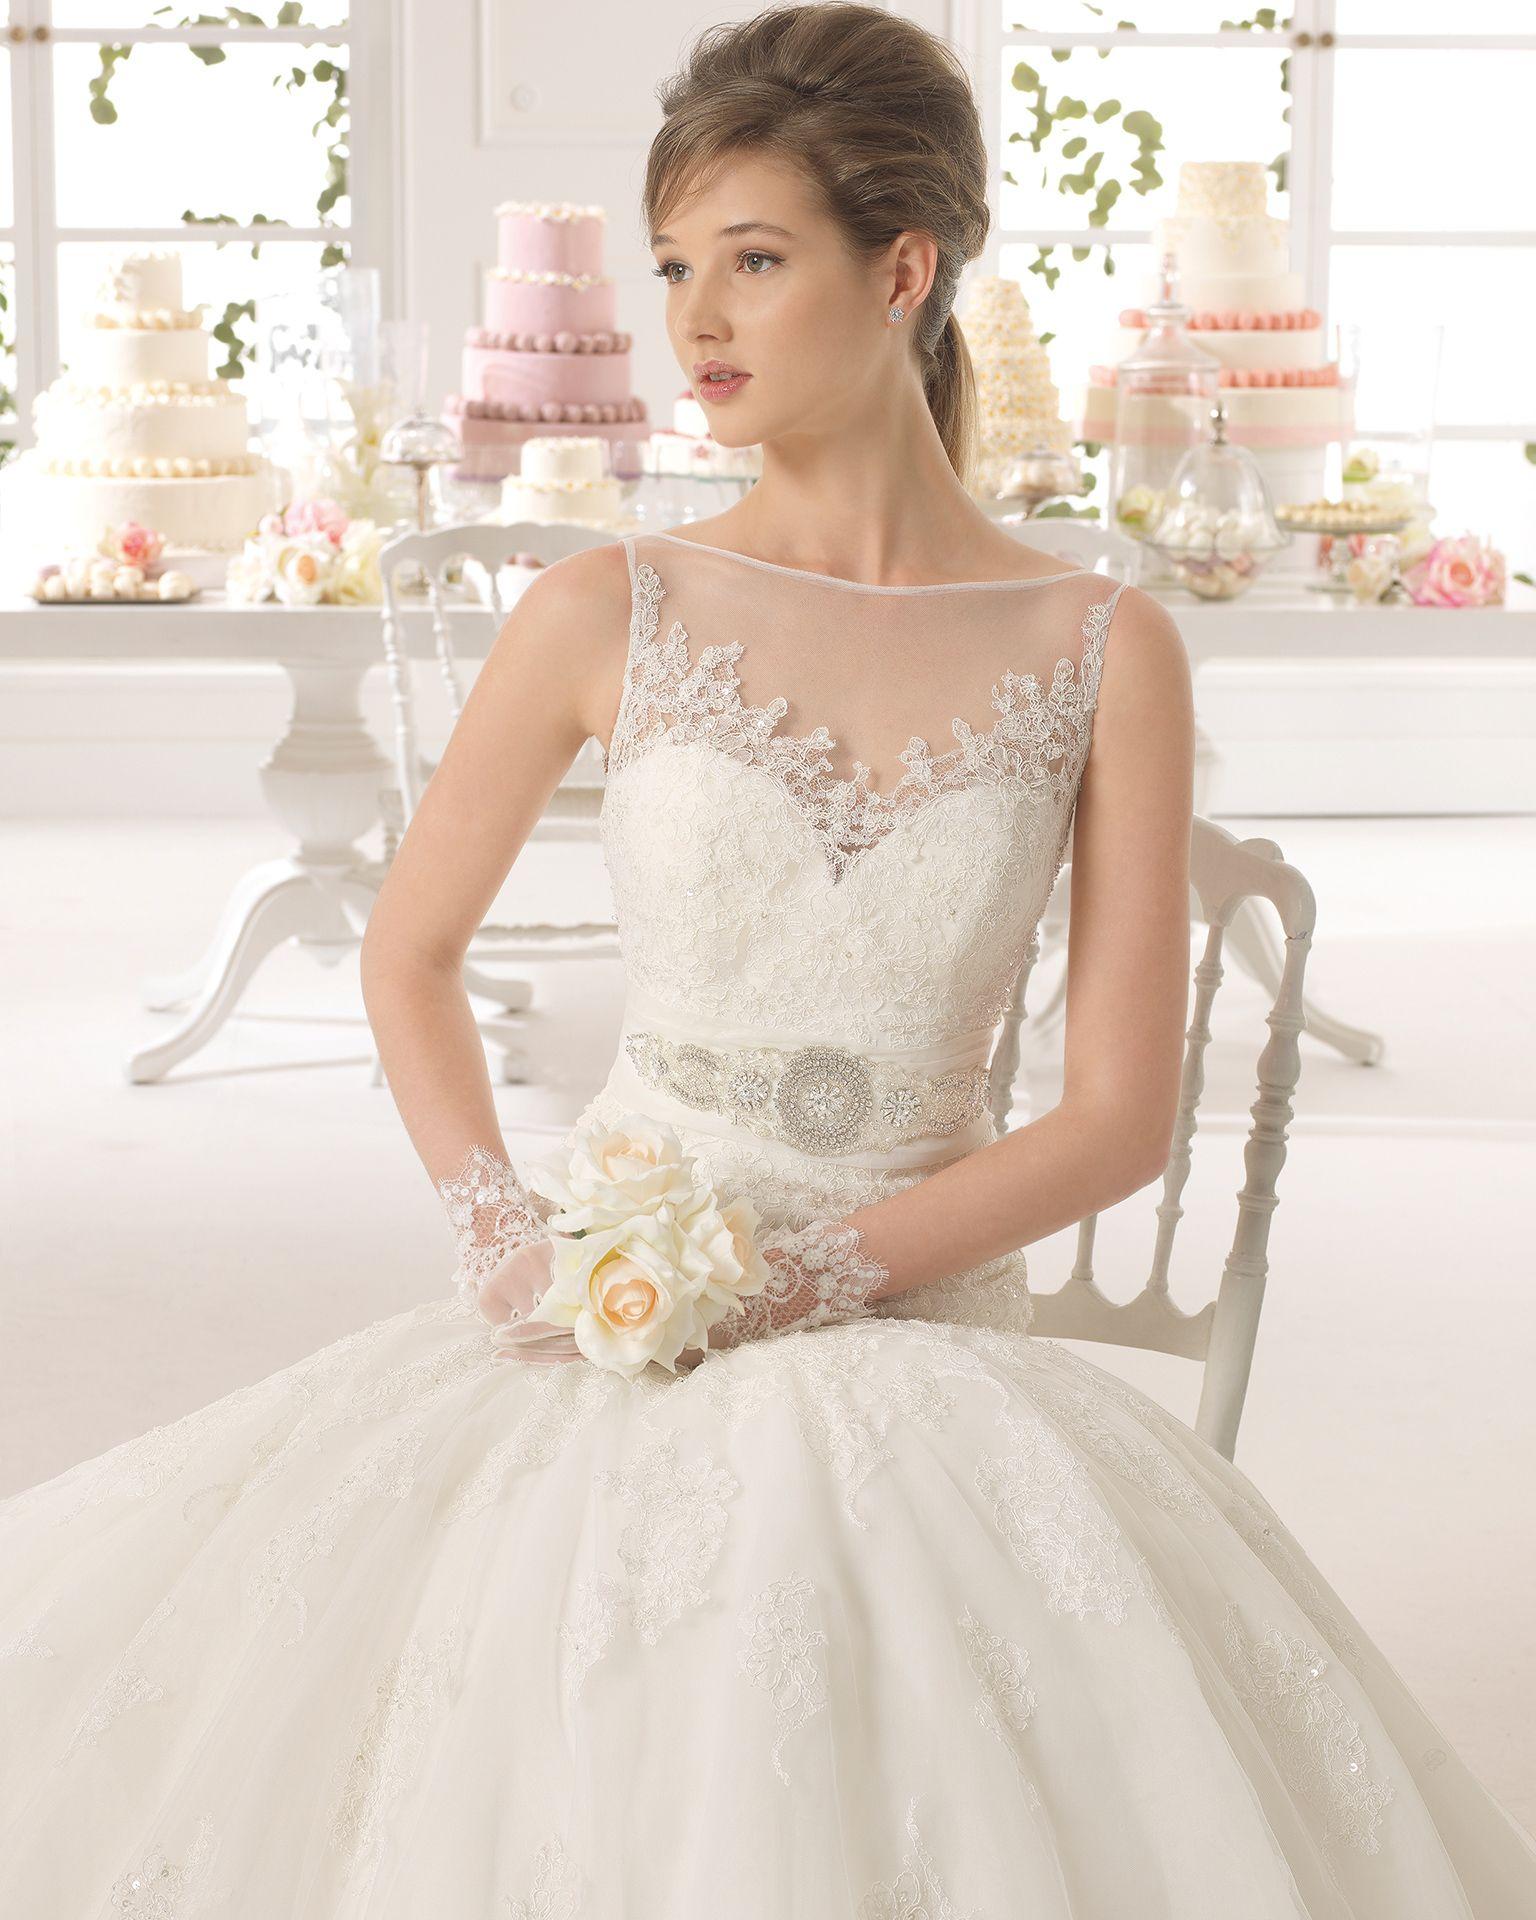 Azahar vestido de novia tejido encaje y pedreria y tul | novias ...